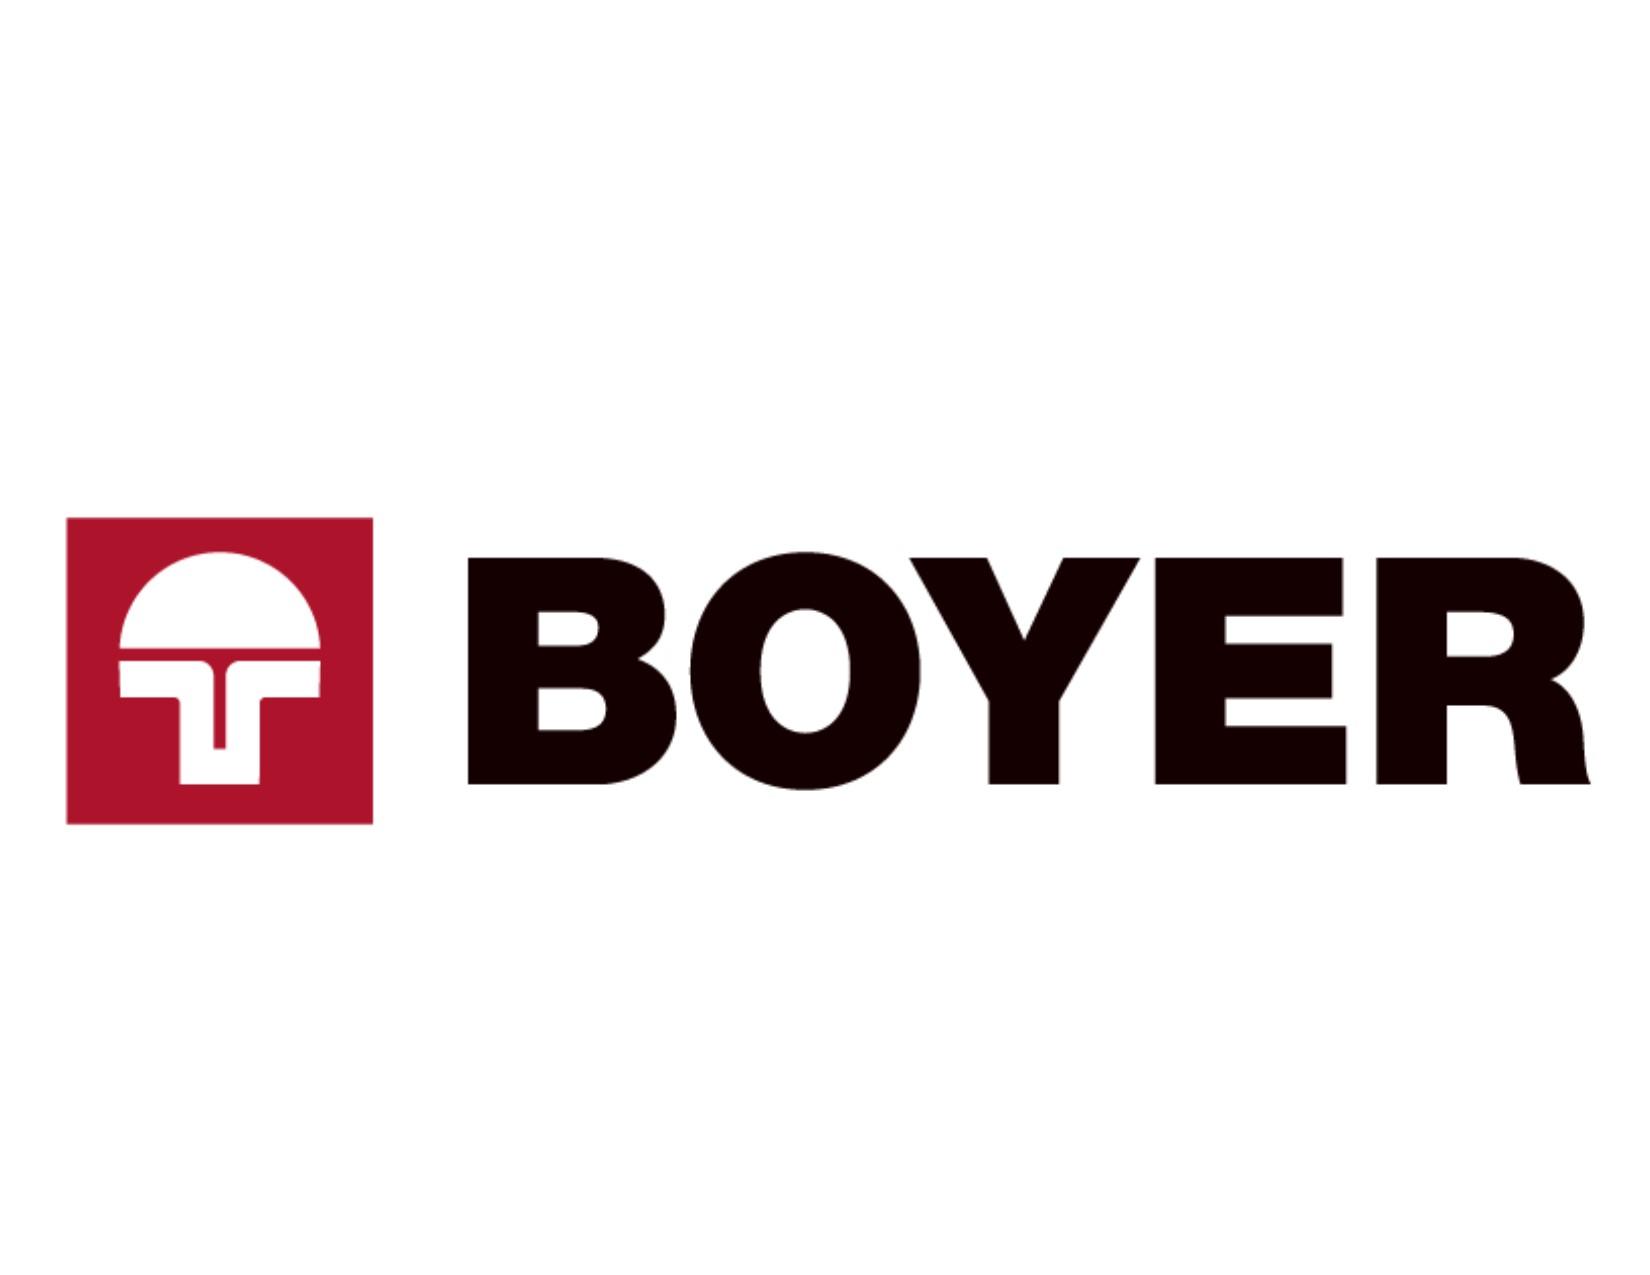 boyer.jpg